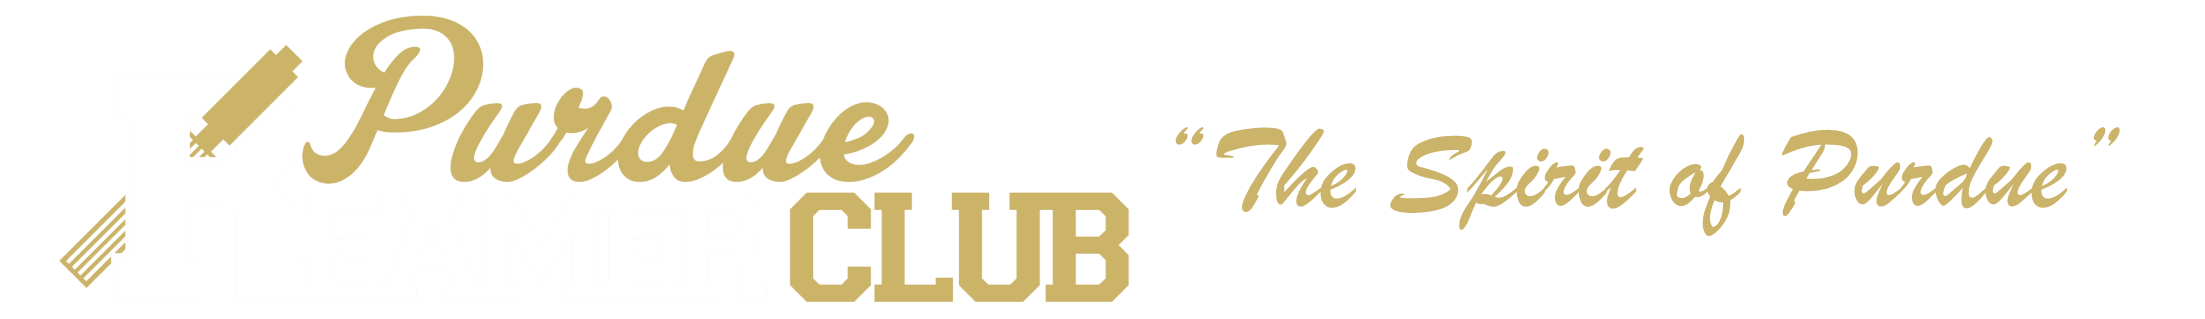 Purdue Reamer Club